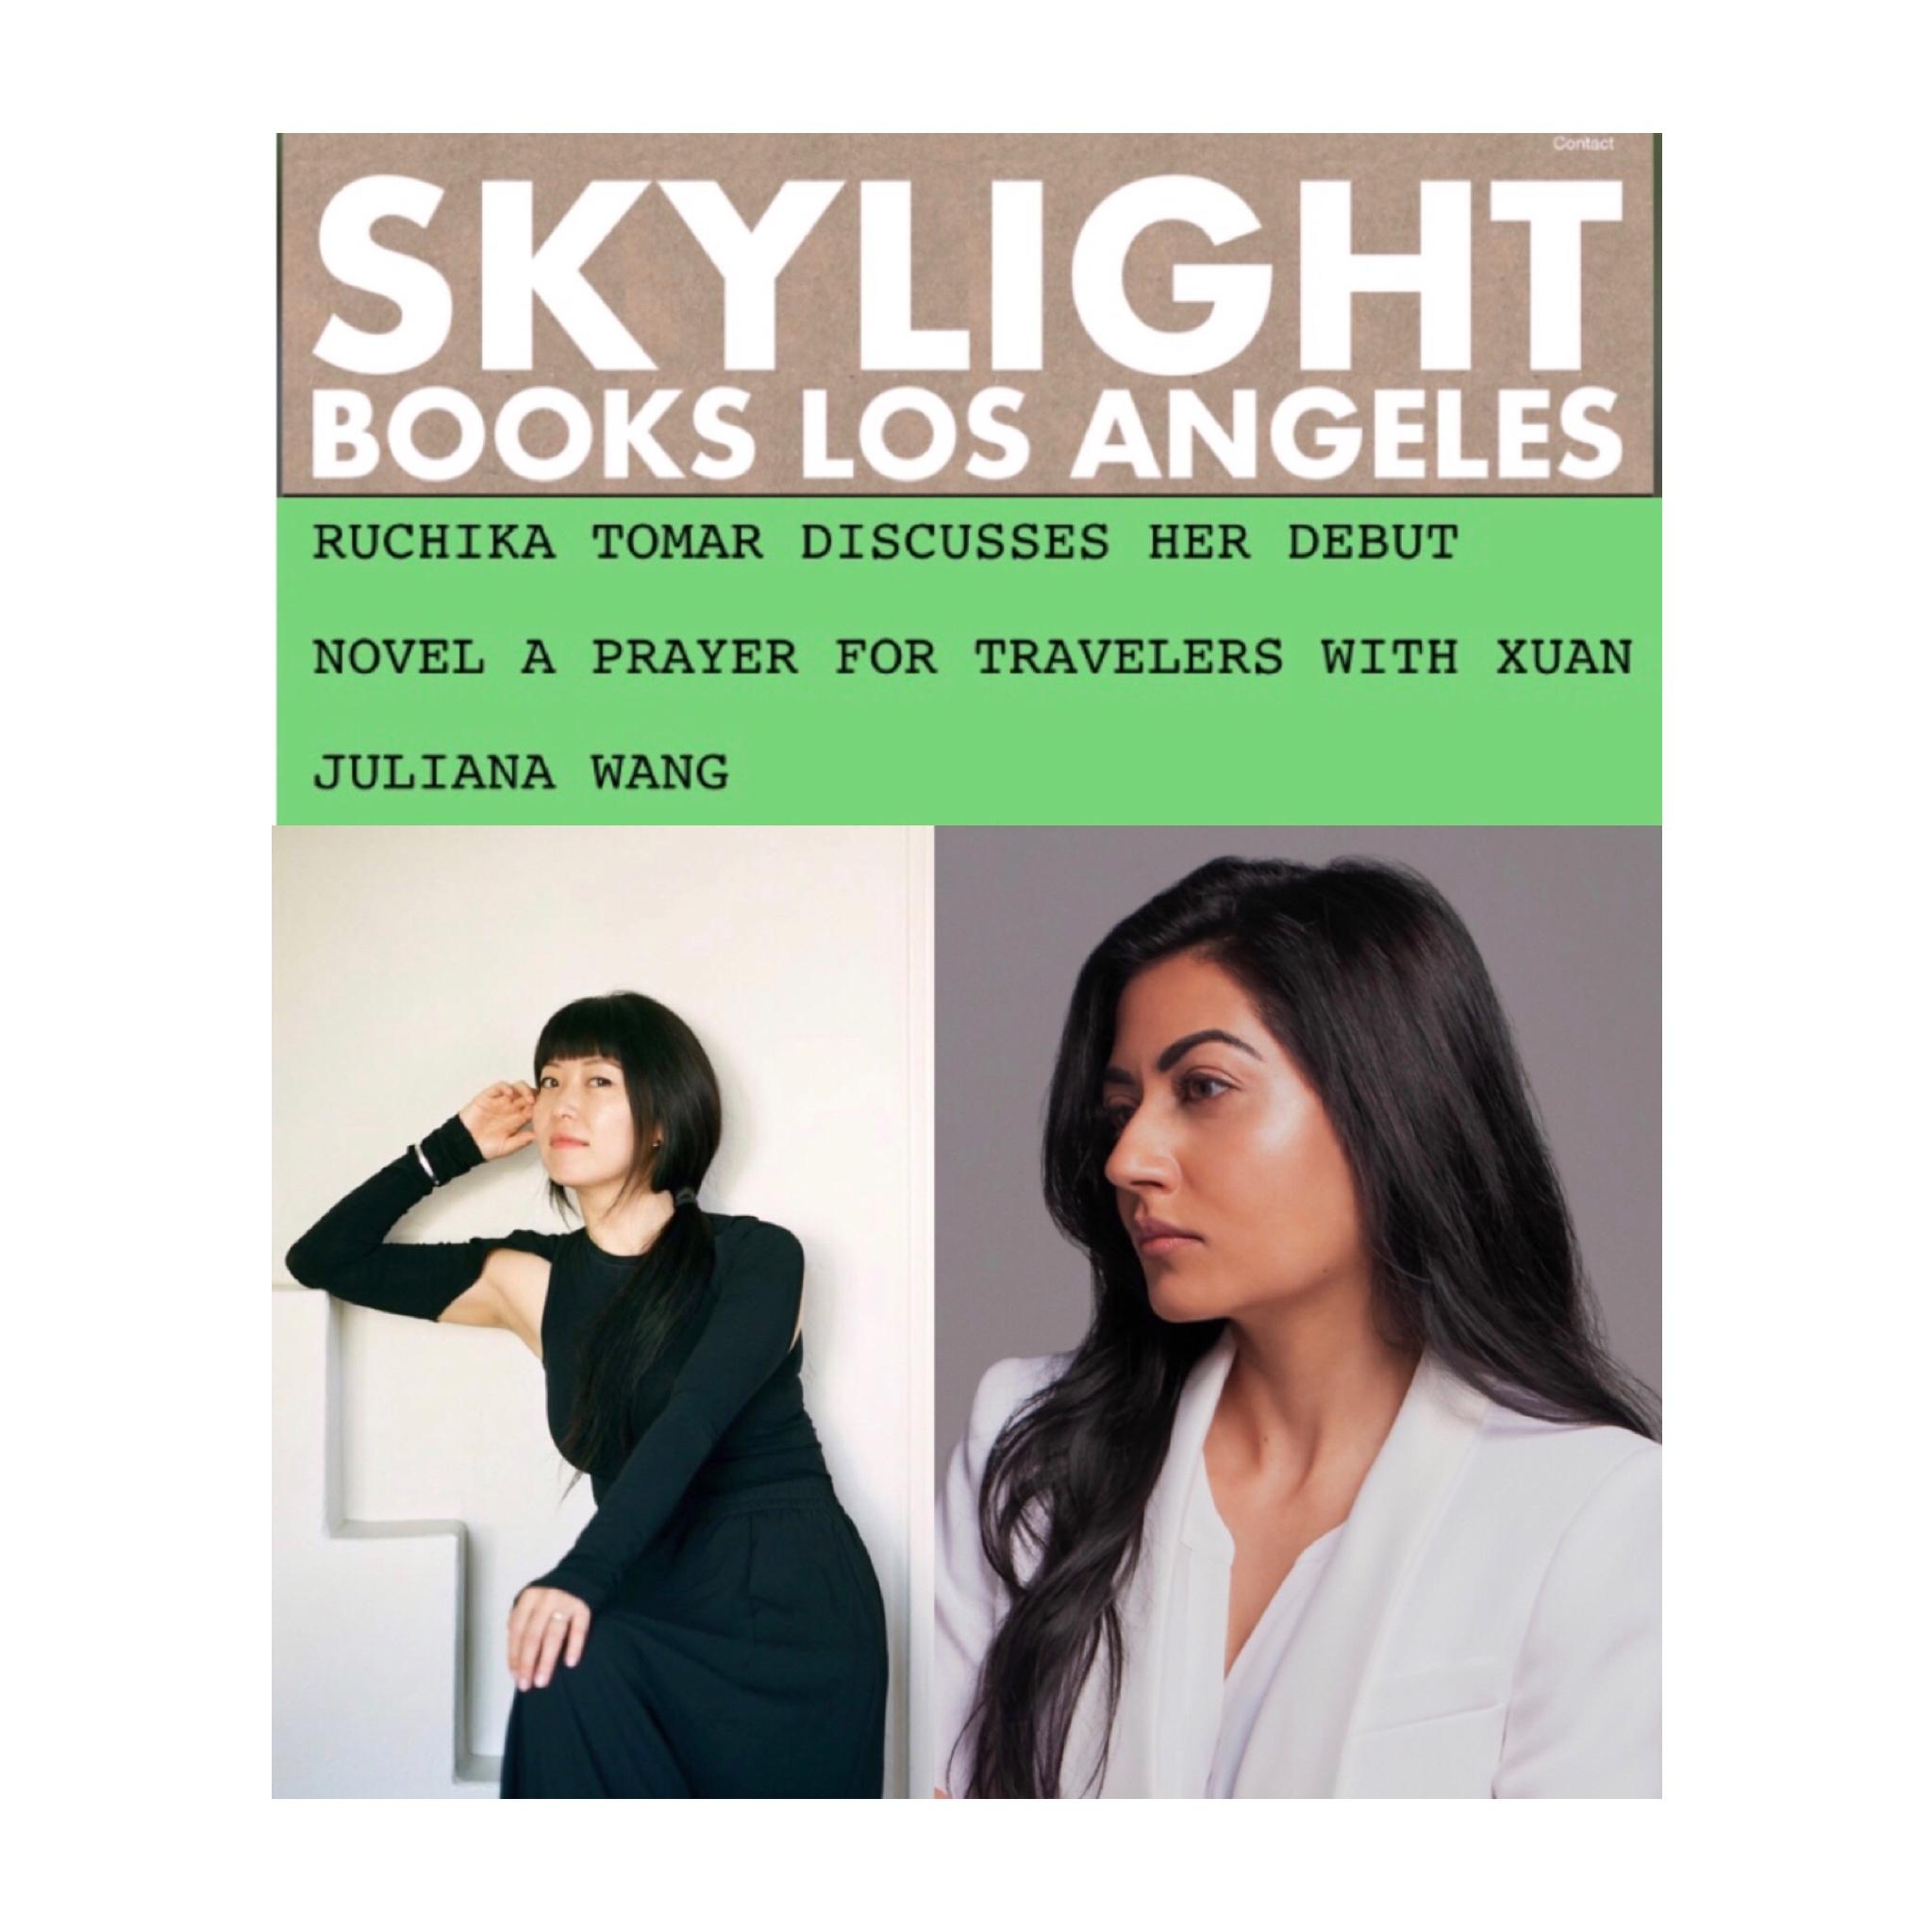 Ruchika Tomar and Xuan Juliana Wang in conversation at Skylight Books.